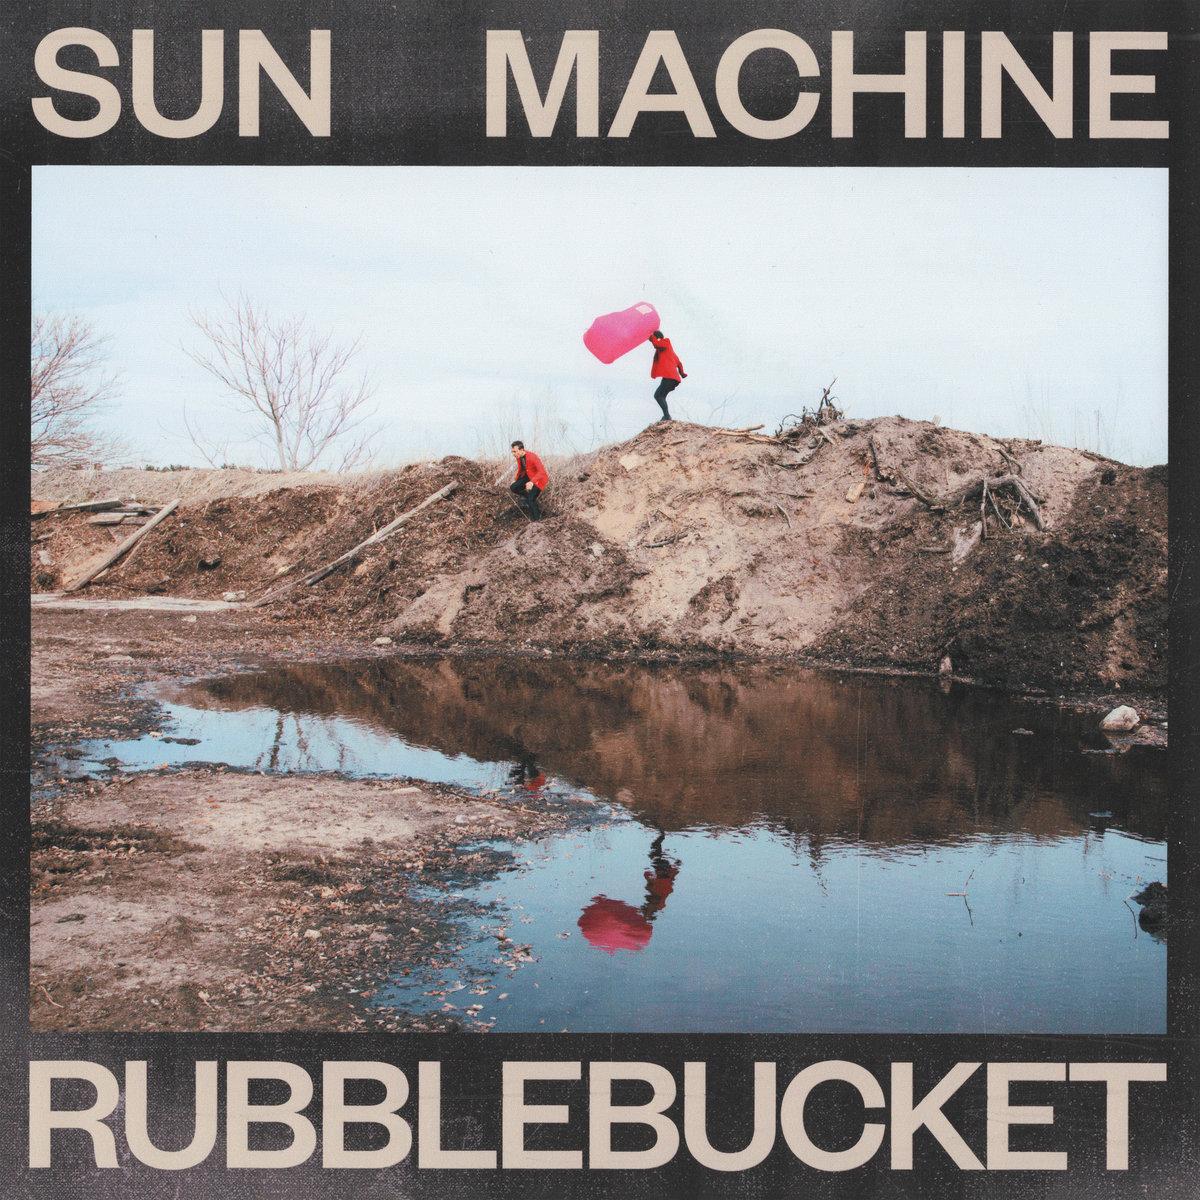 rubblebucket.jpg